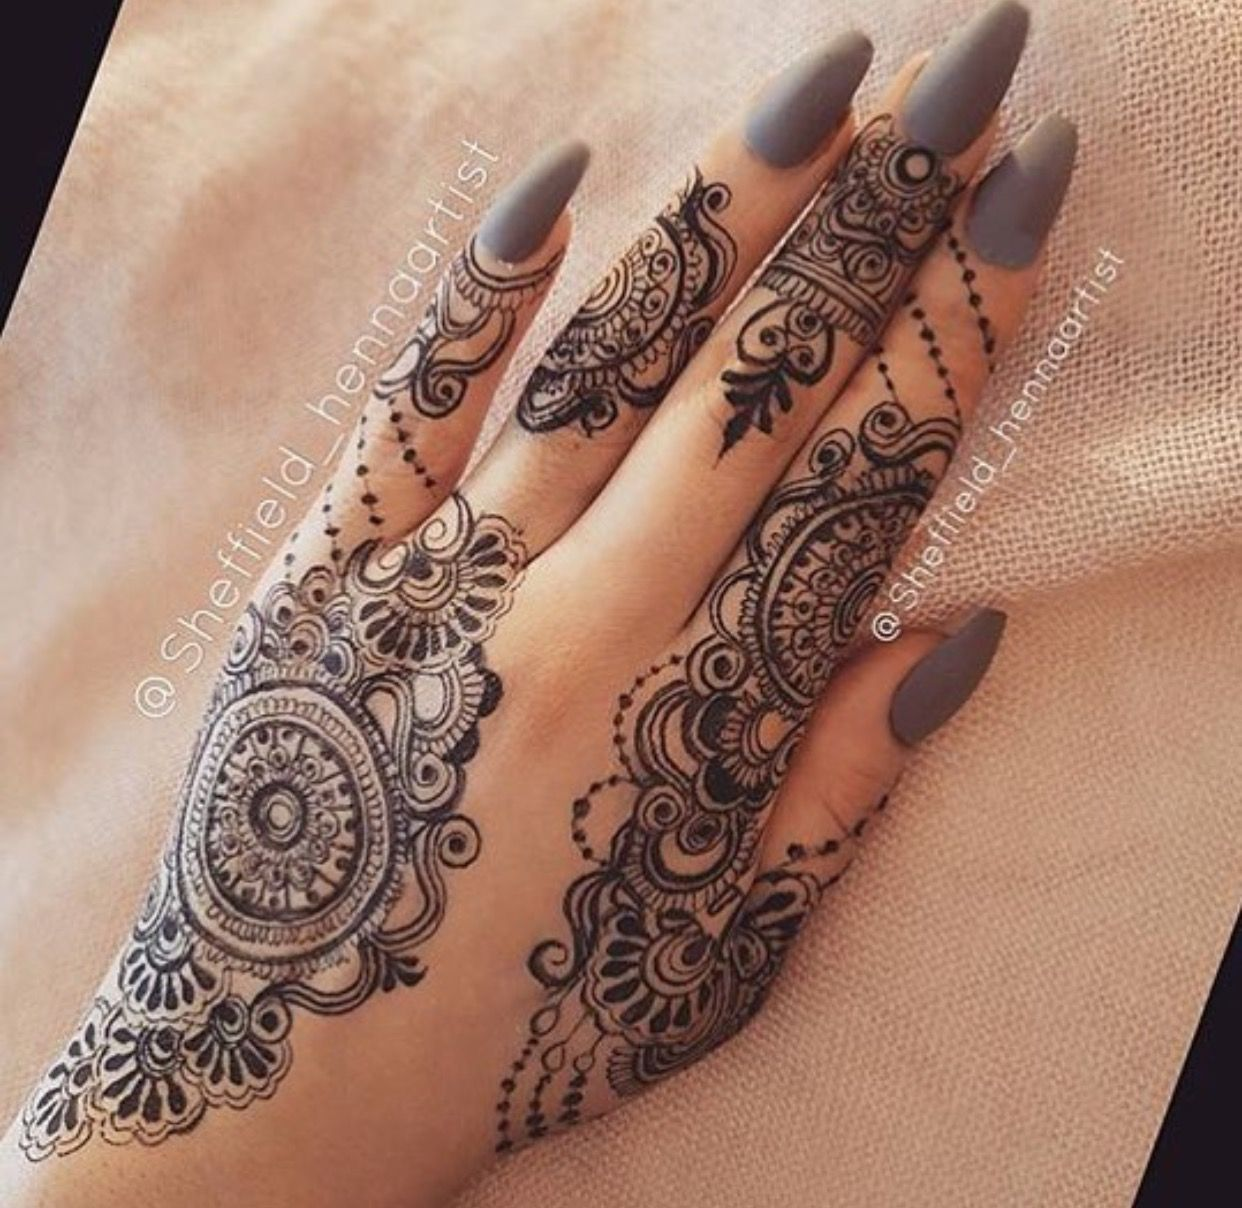 Pinterest Mountain Henna Tattoo Pics: Finger Henna, Henna Designs Hand